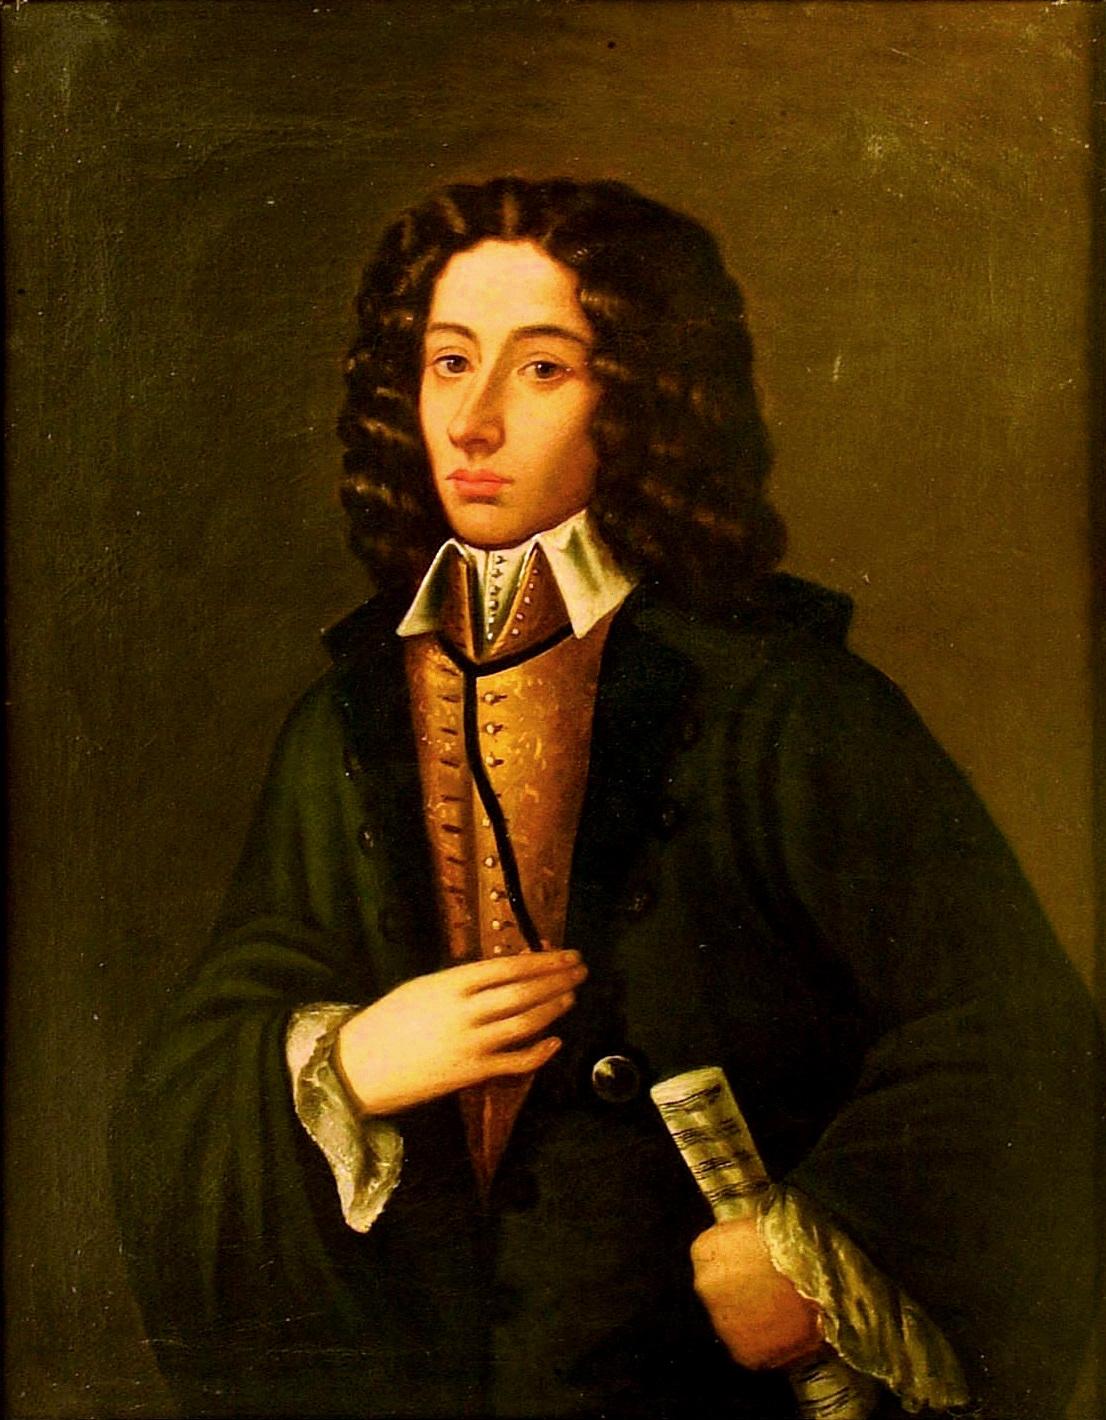 Giovanni_Battista_Pergolesi